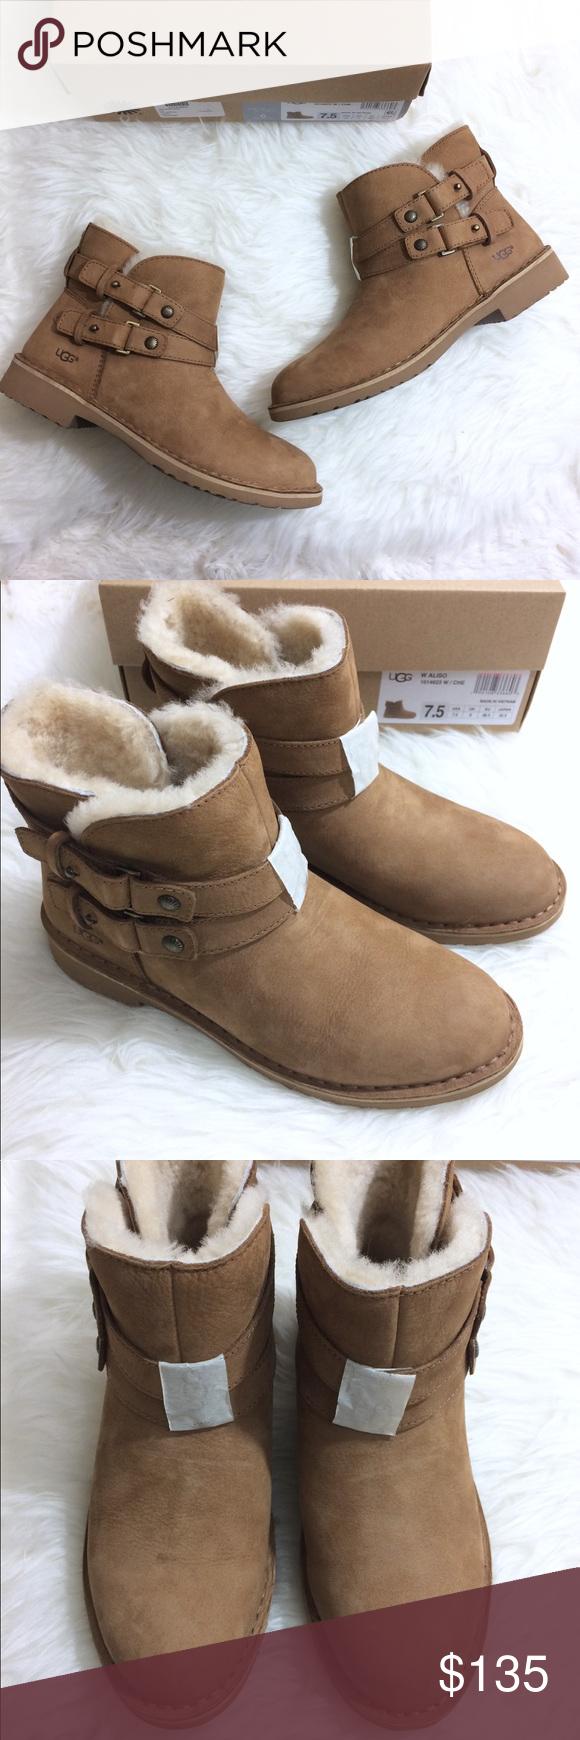 436d4e740fb UGG Aliso 7.5 Chestnut Tan Ugg Short Boots New Ugg Australia Aliso ...